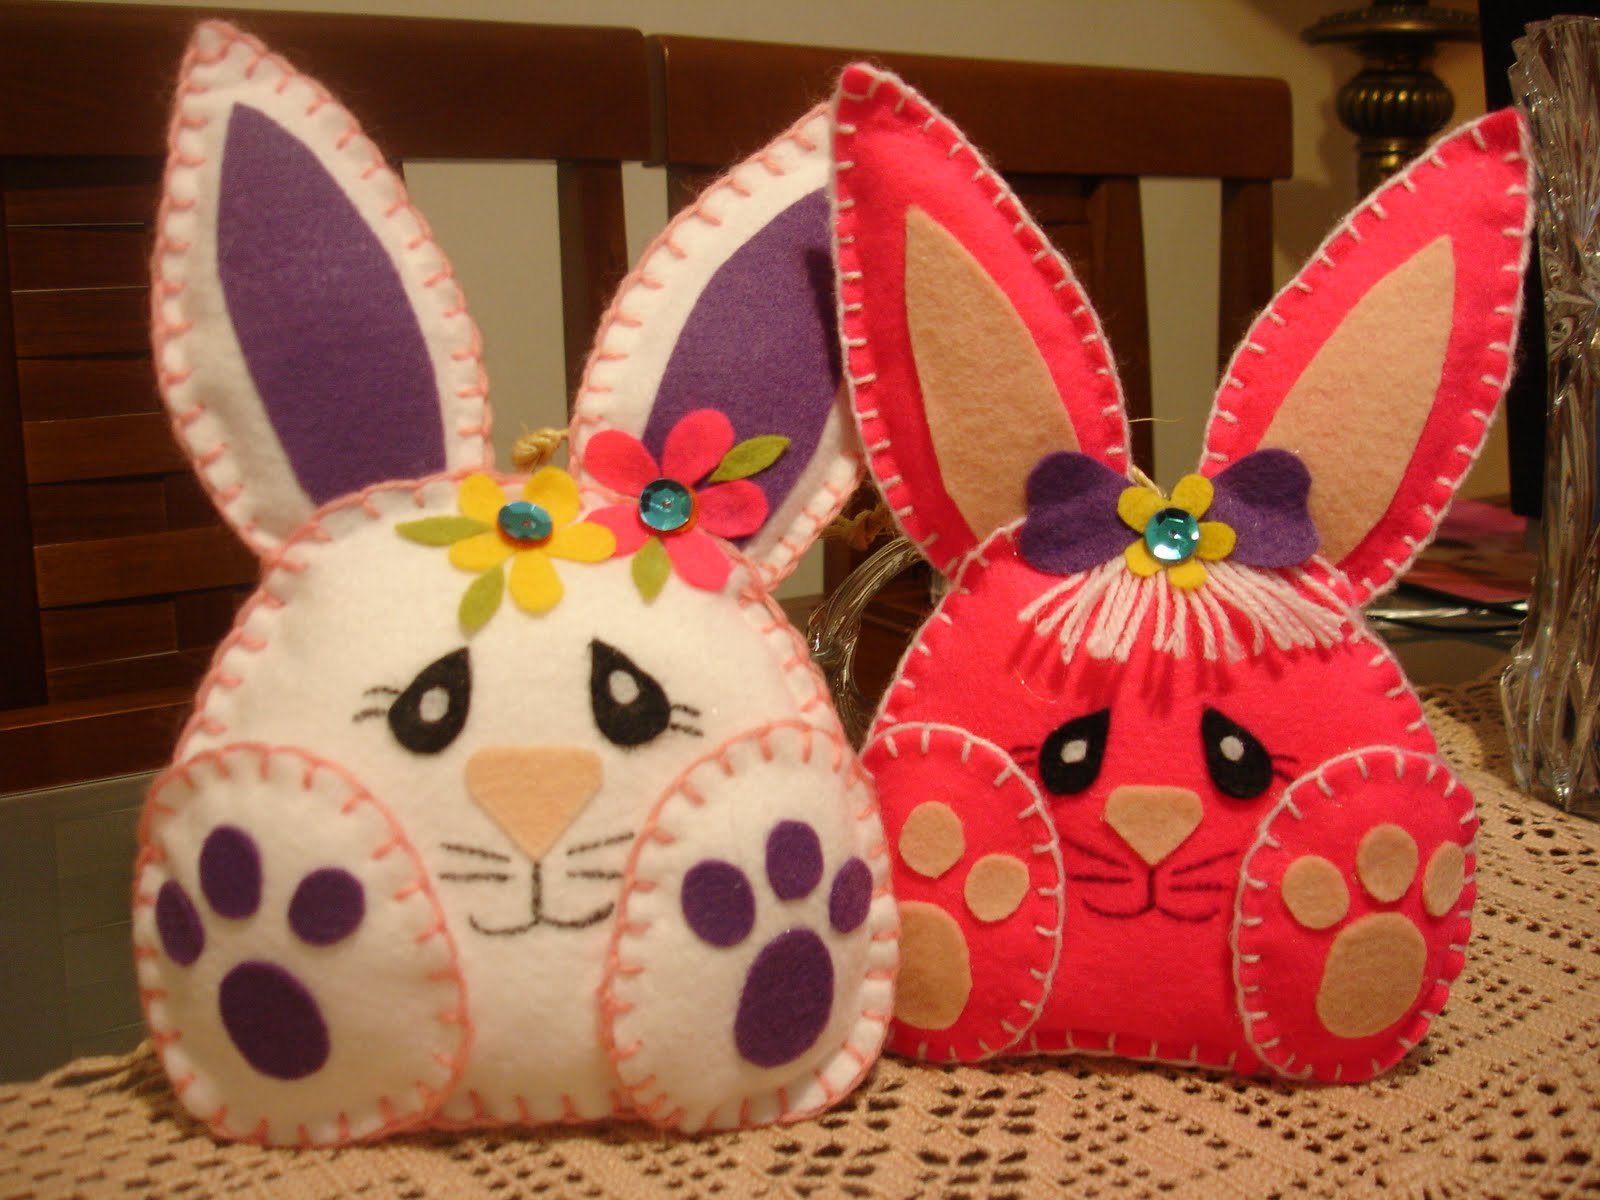 Armario Baño Ikea Hemnes ~ Blog da Suzy Coelhinhos da Páscoa Artesanato e Doces